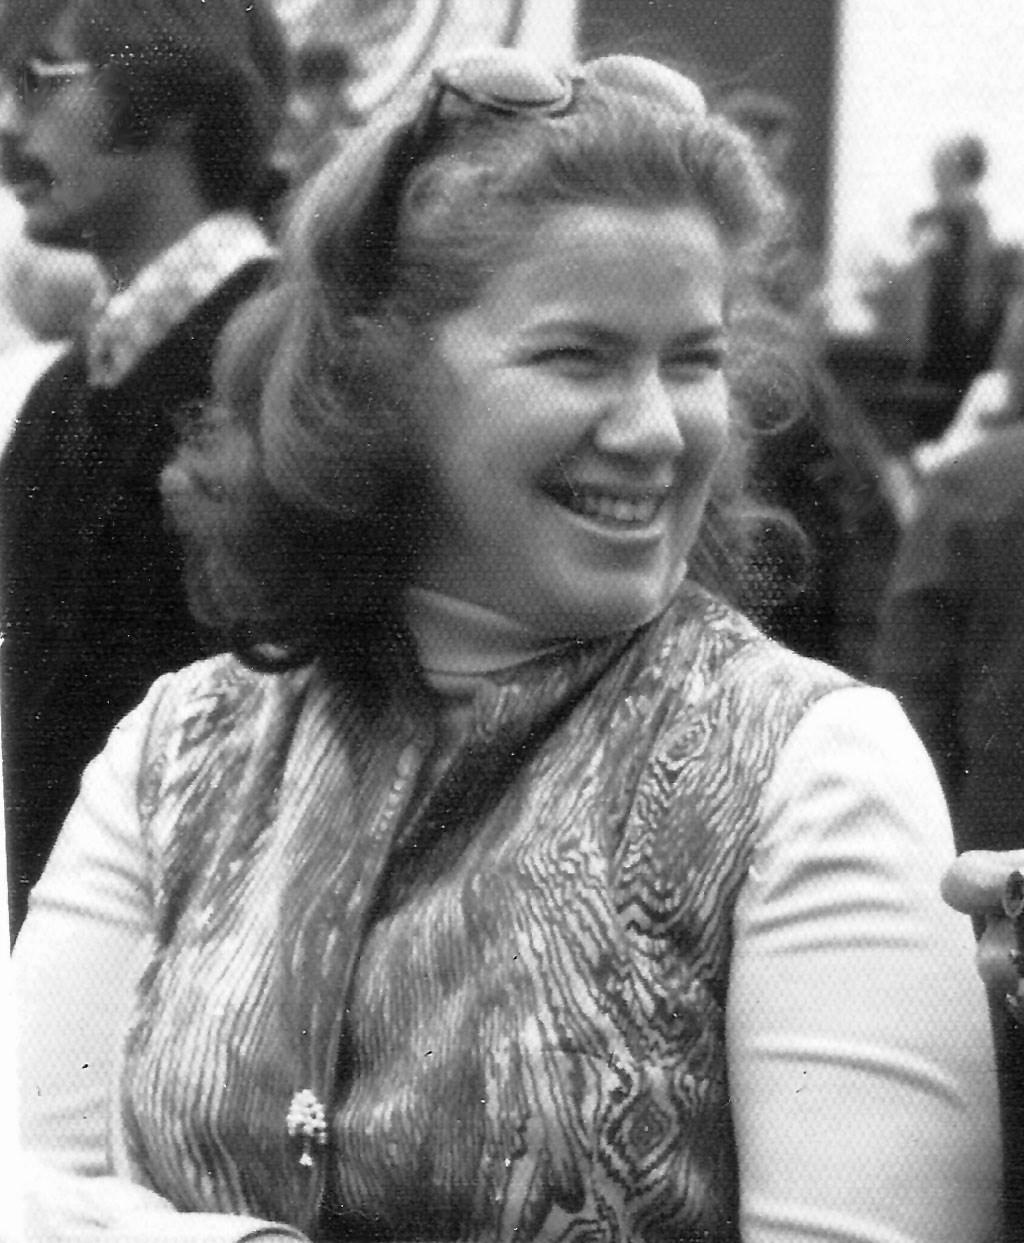 Lillian Hurst pictures